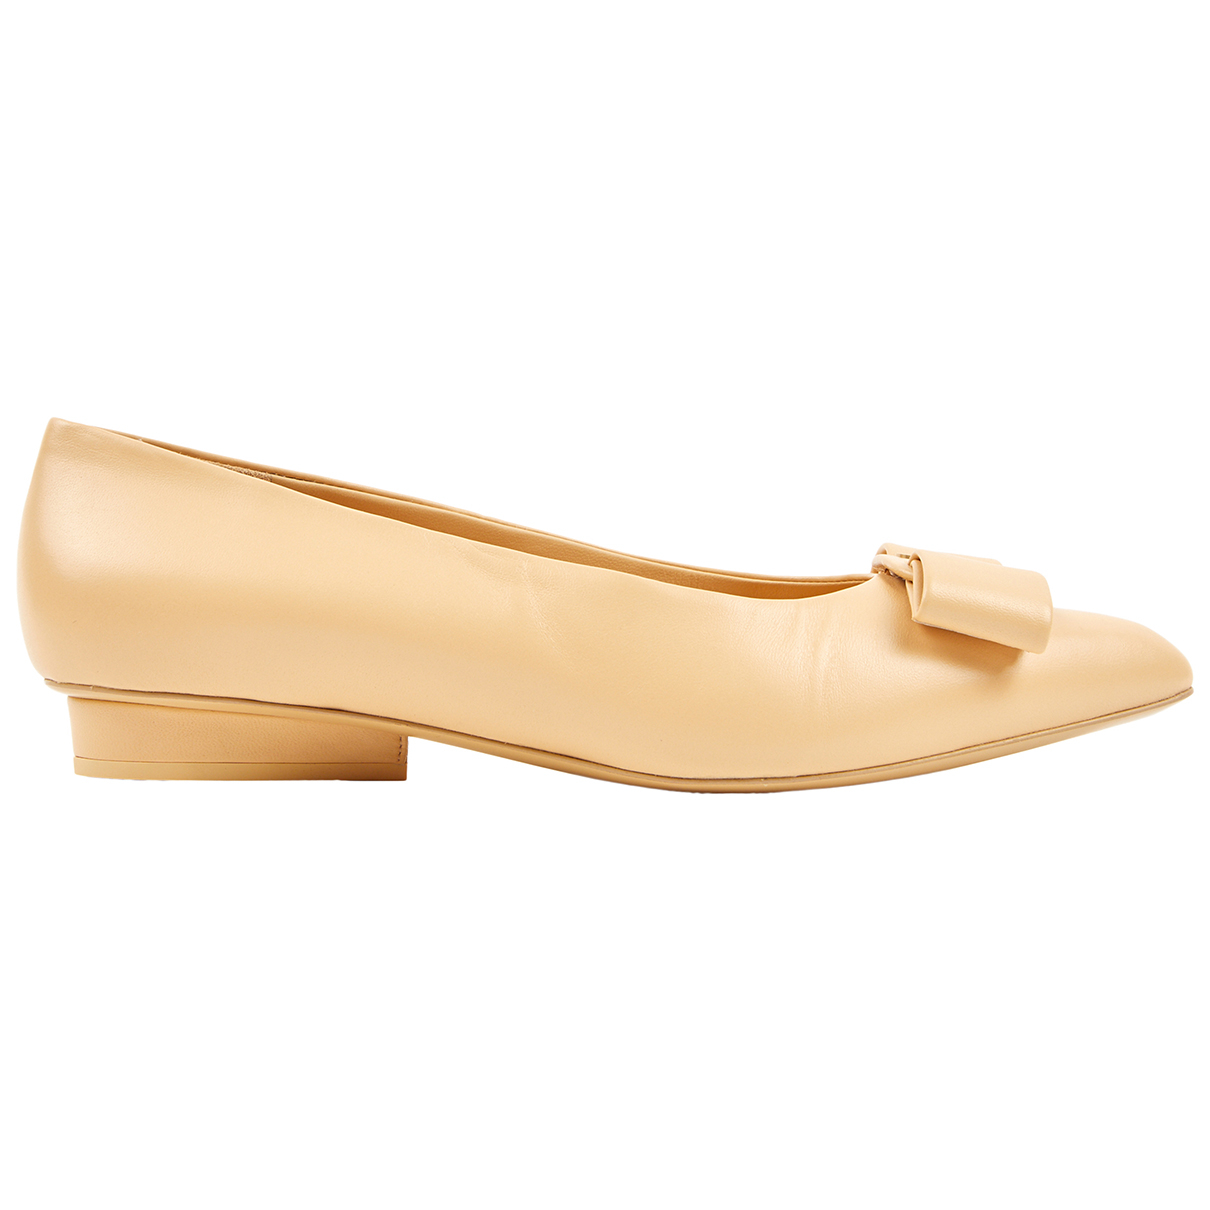 Salvatore Ferragamo N Beige Leather Heels for Women 39.5 EU